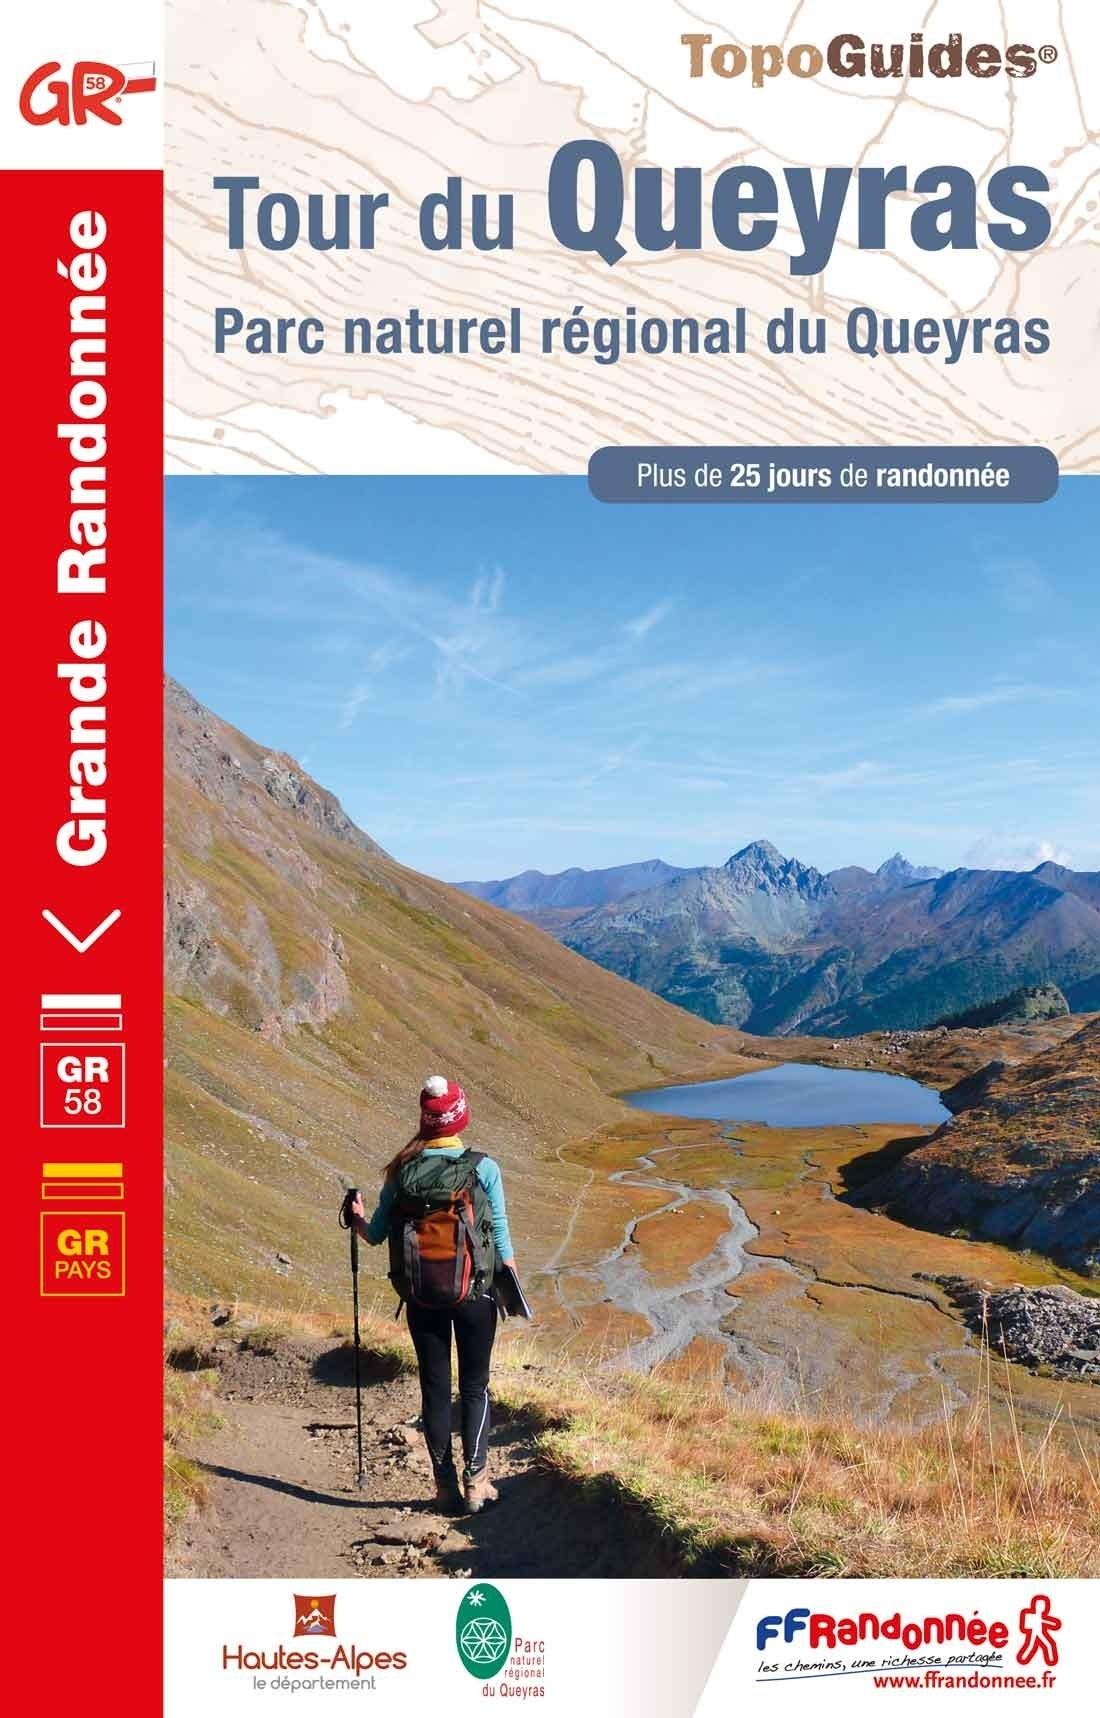 TG505  Tour du Queyras | wandelgids GR-58 9782751403132  FFRP Topoguides  Meerdaagse wandelroutes, Wandelgidsen Écrins, Queyras